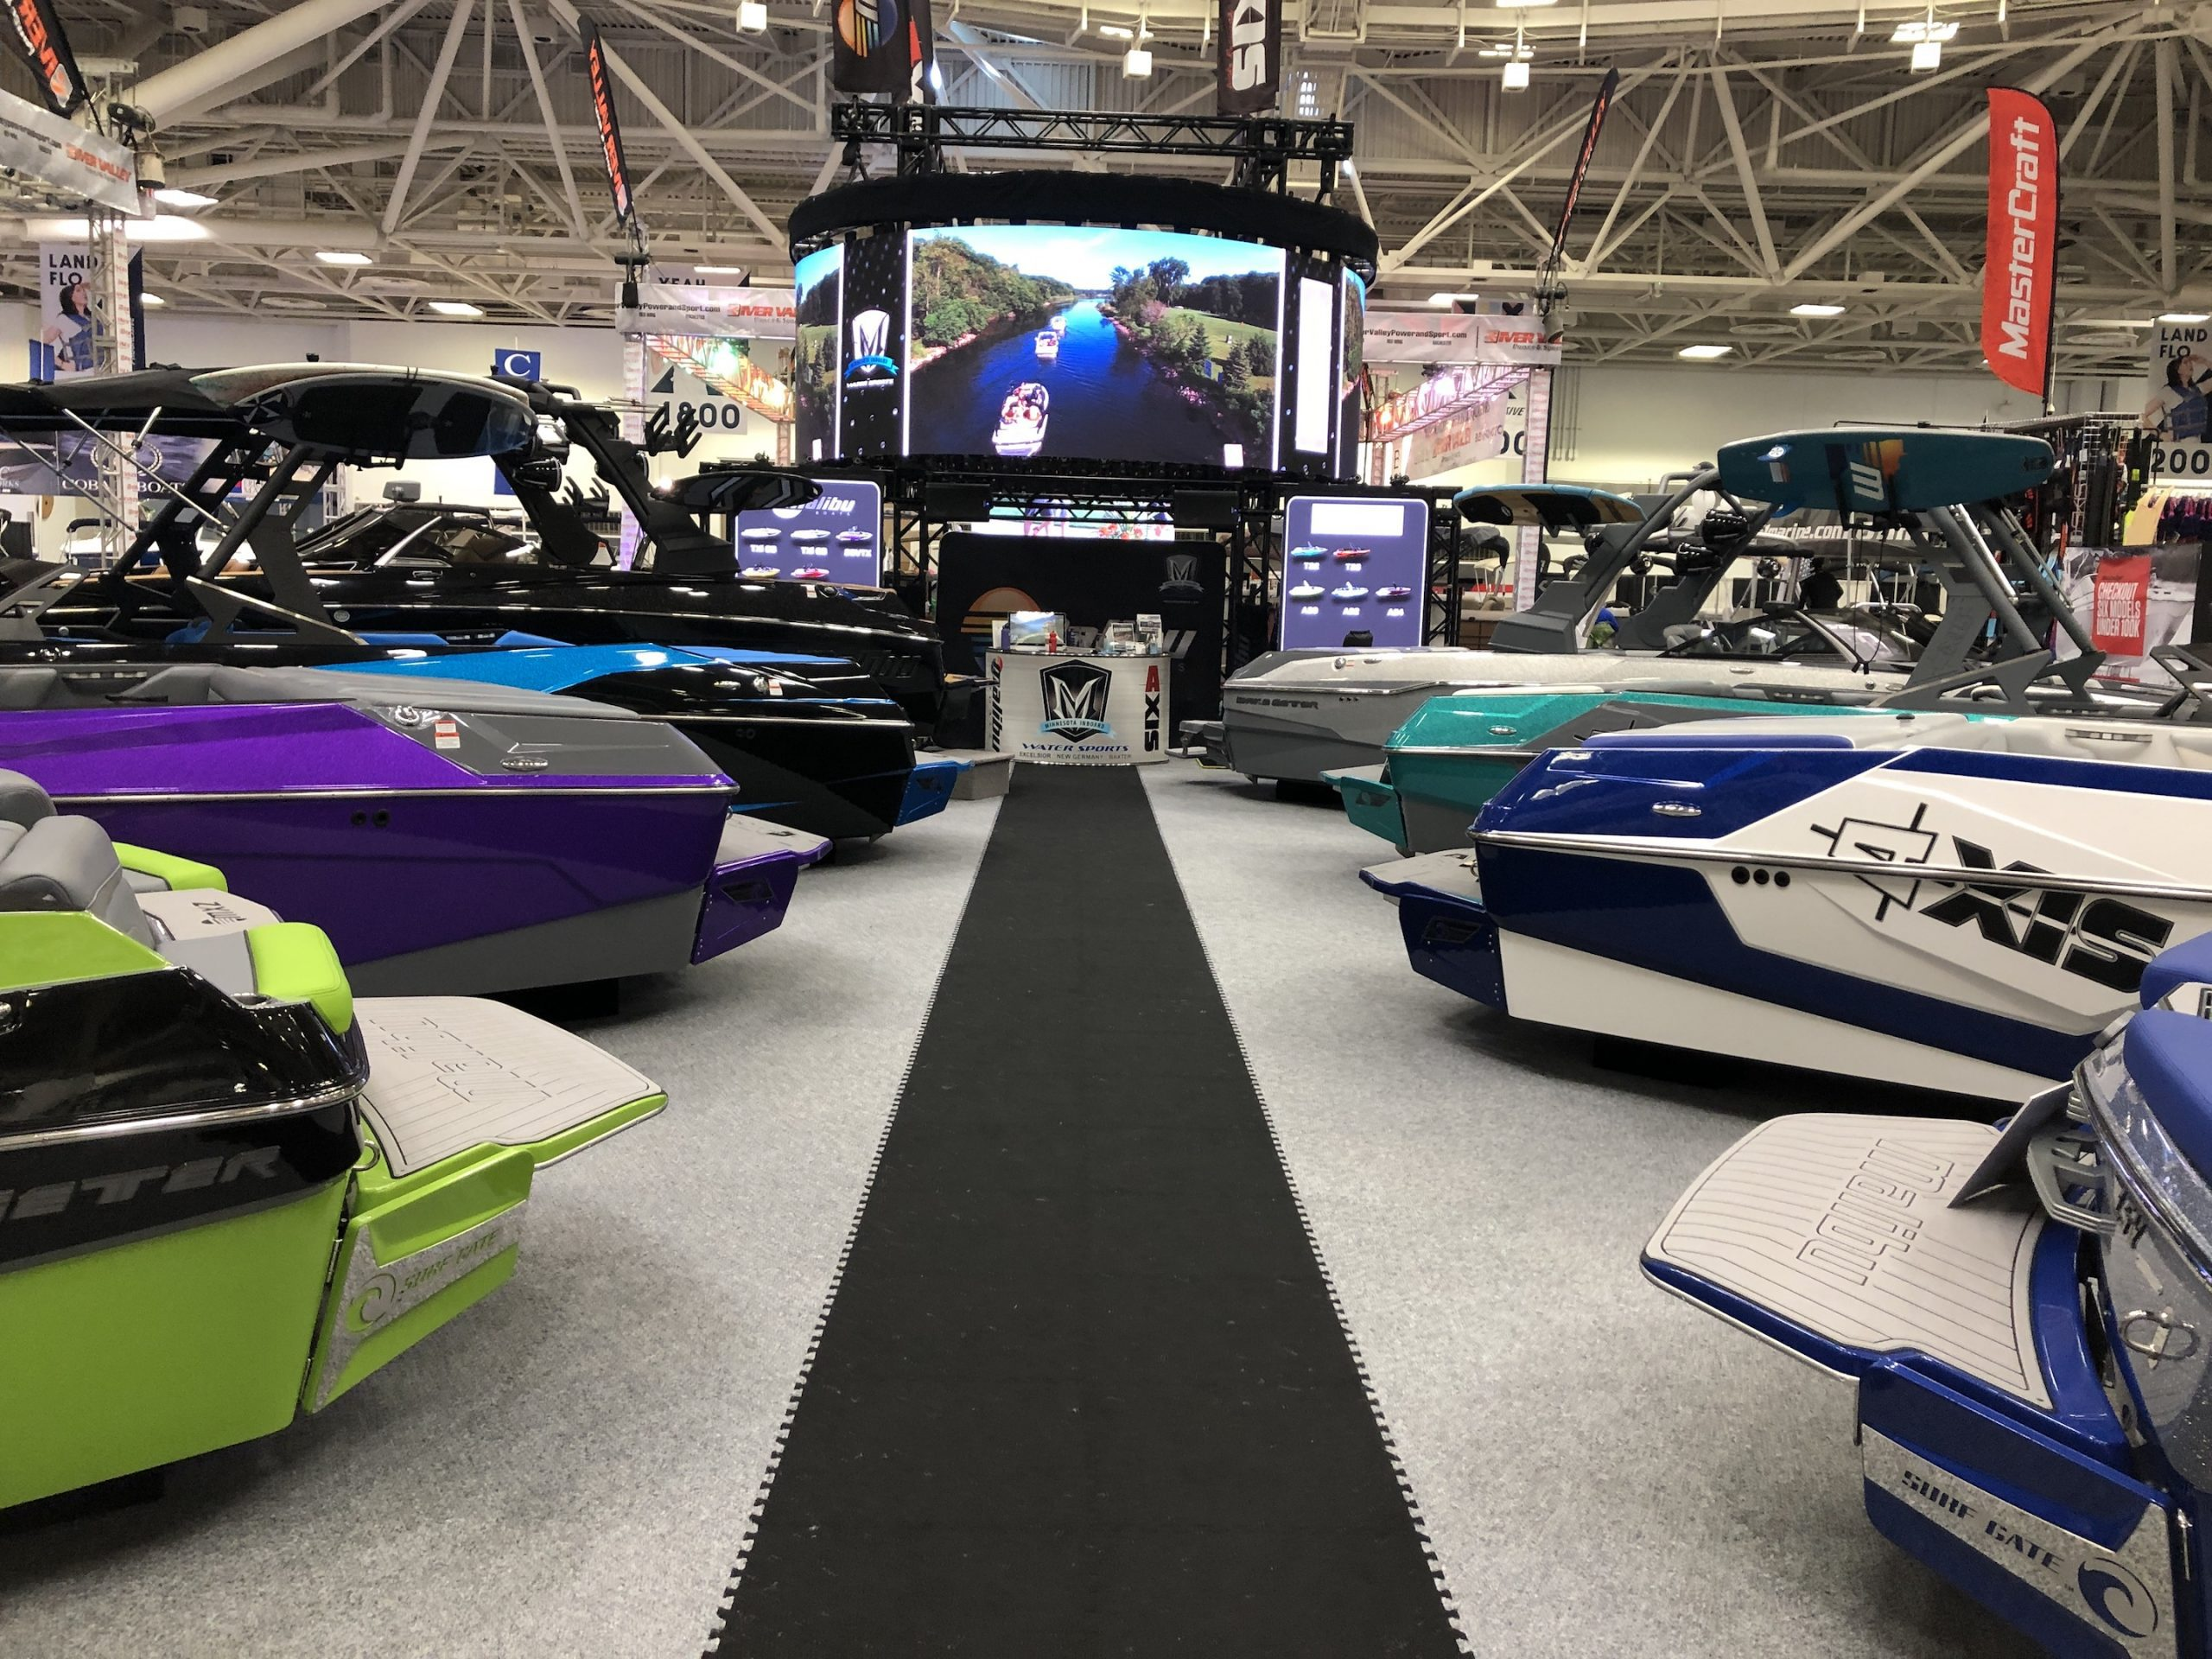 2020 Minneapolis Boat Show